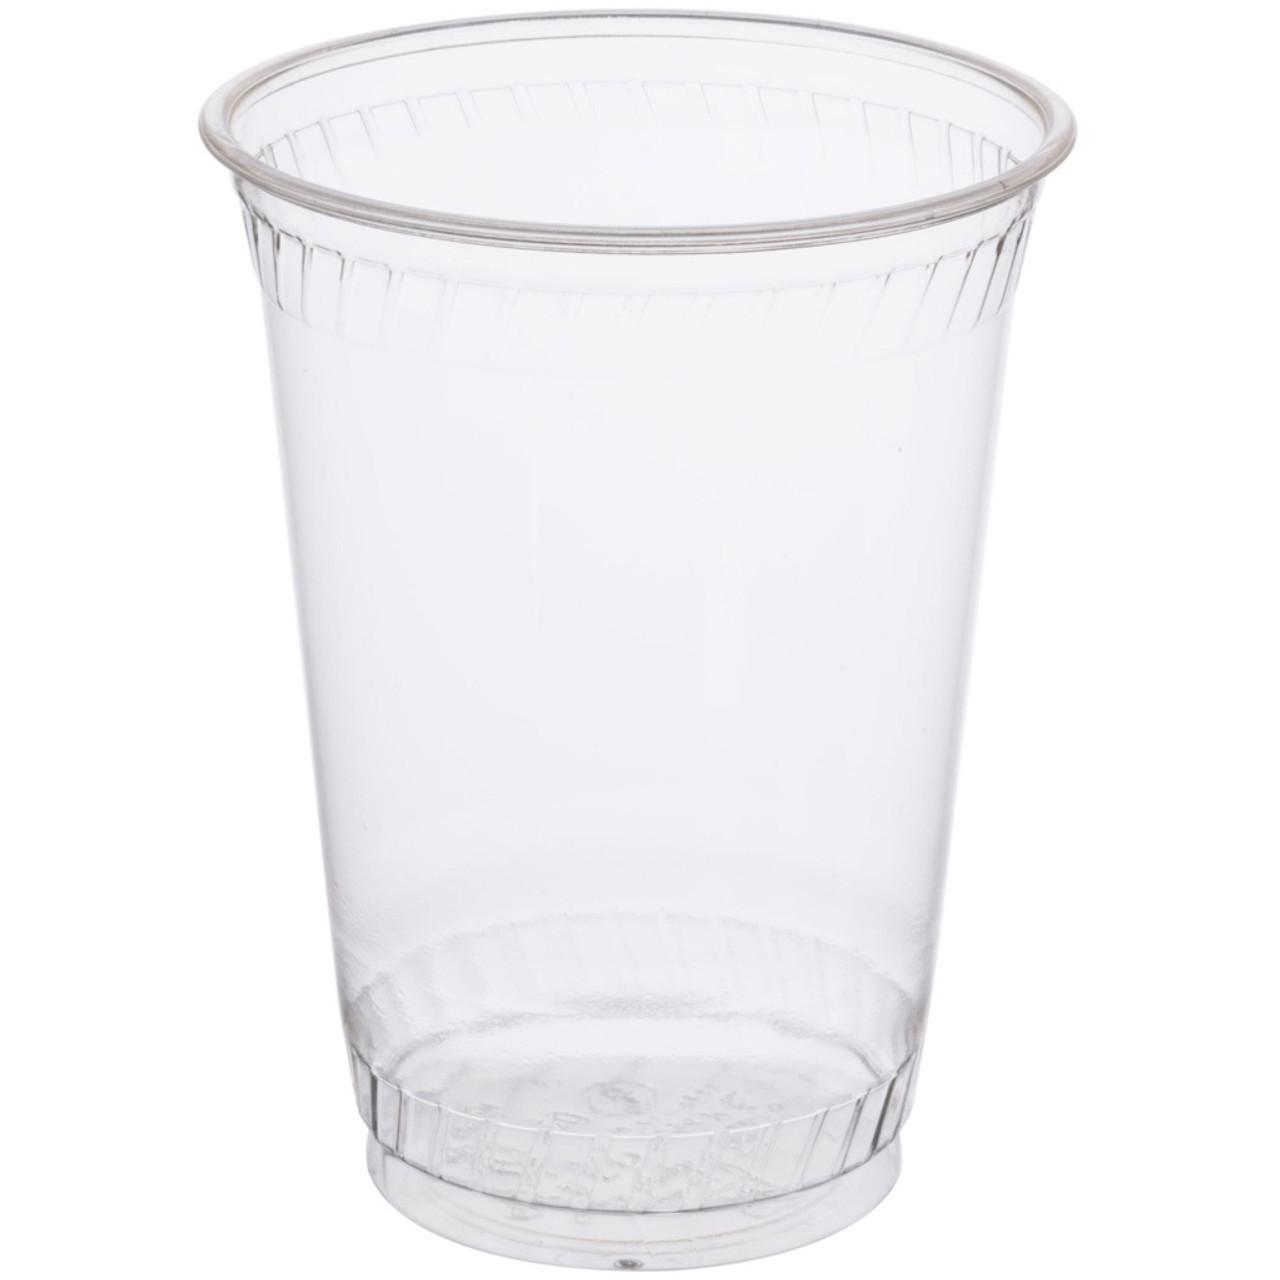 Cold Cups - Greenware - No Printing - 24oz